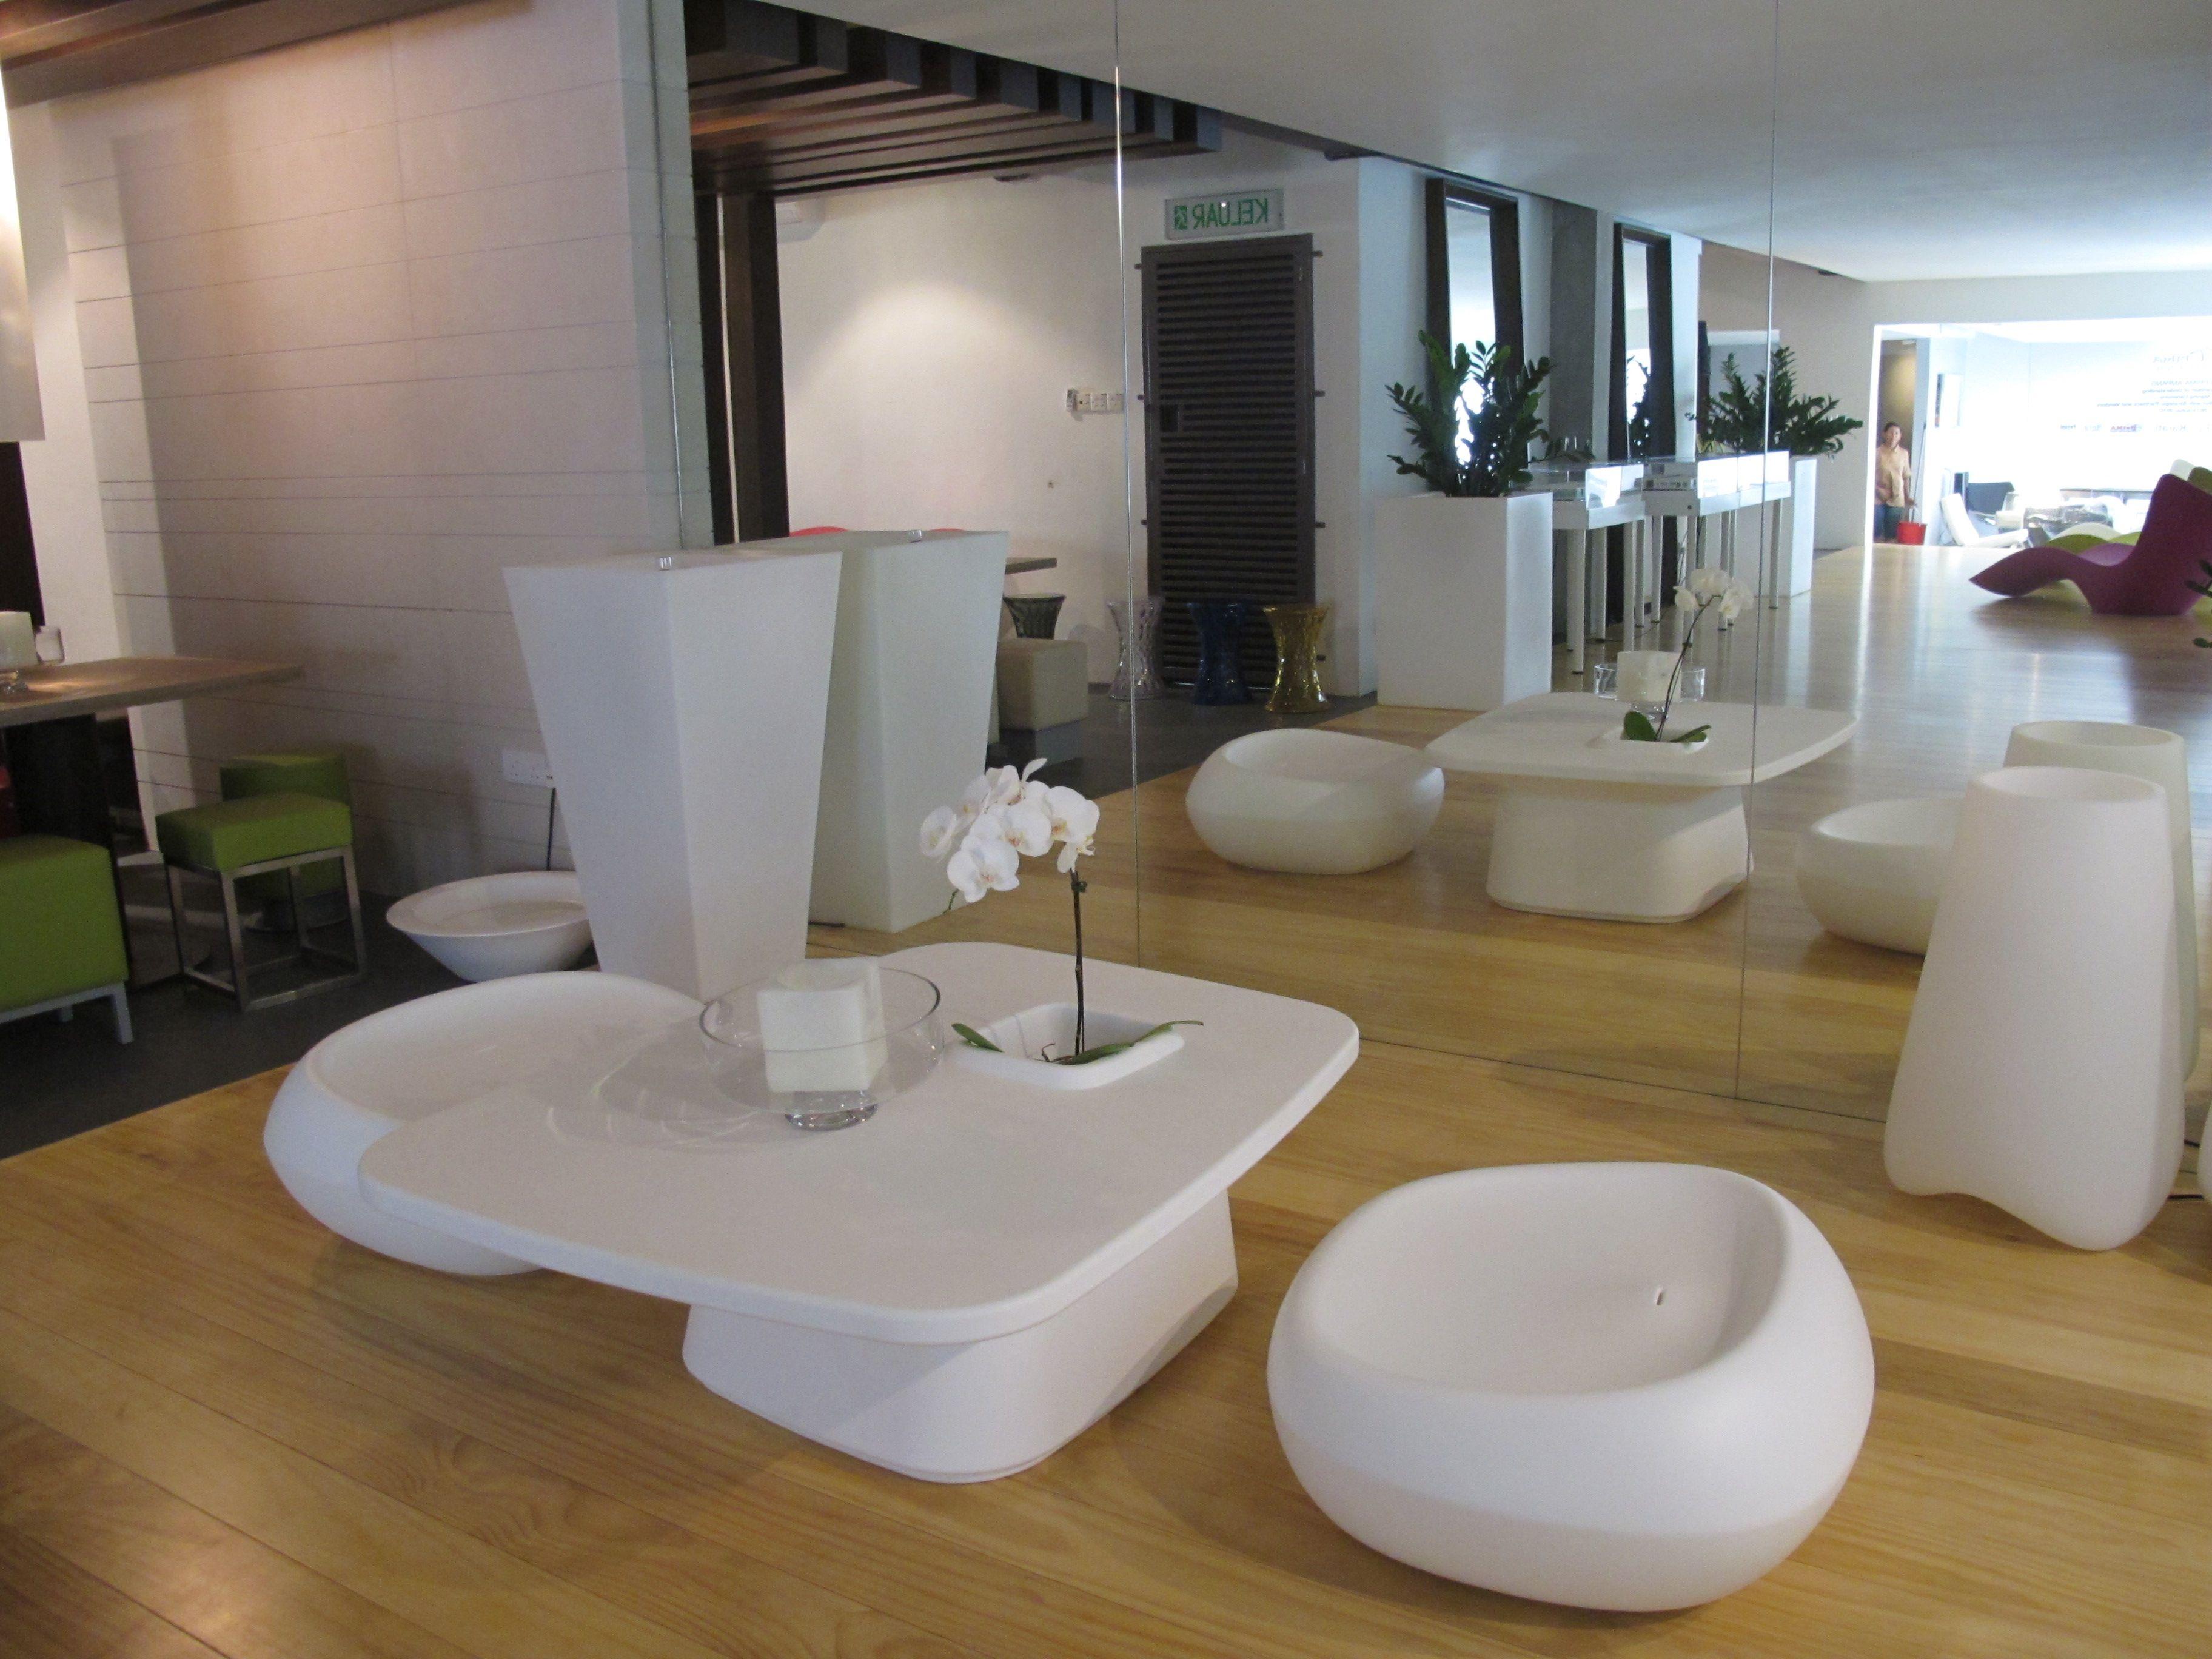 Translucent coated Accoya® wood used for the flooring of